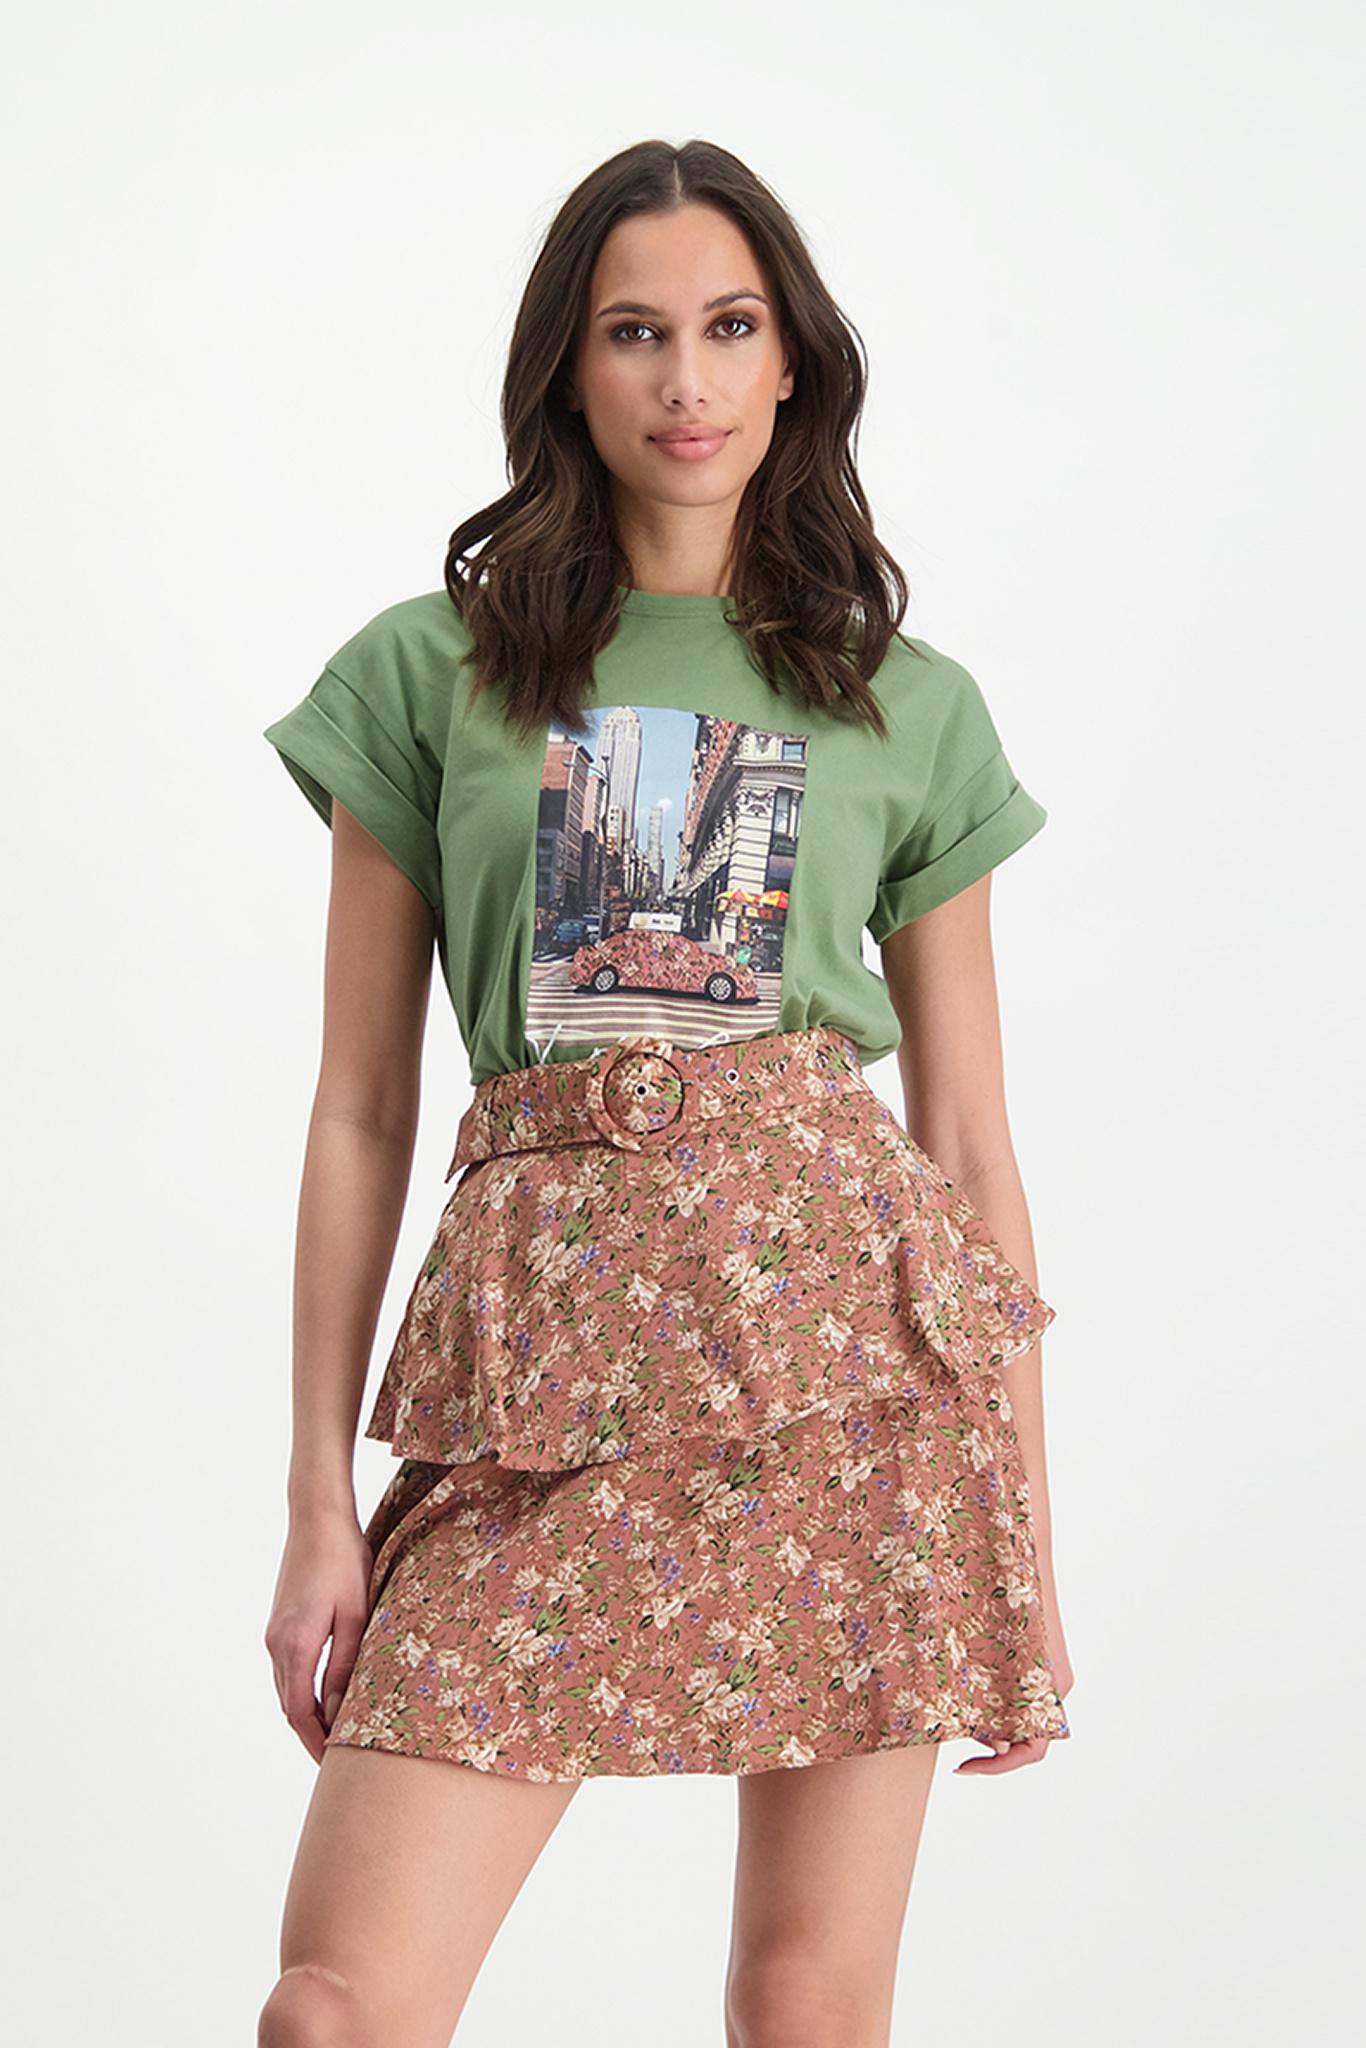 Lofty Manner Green T-shirt Alyda